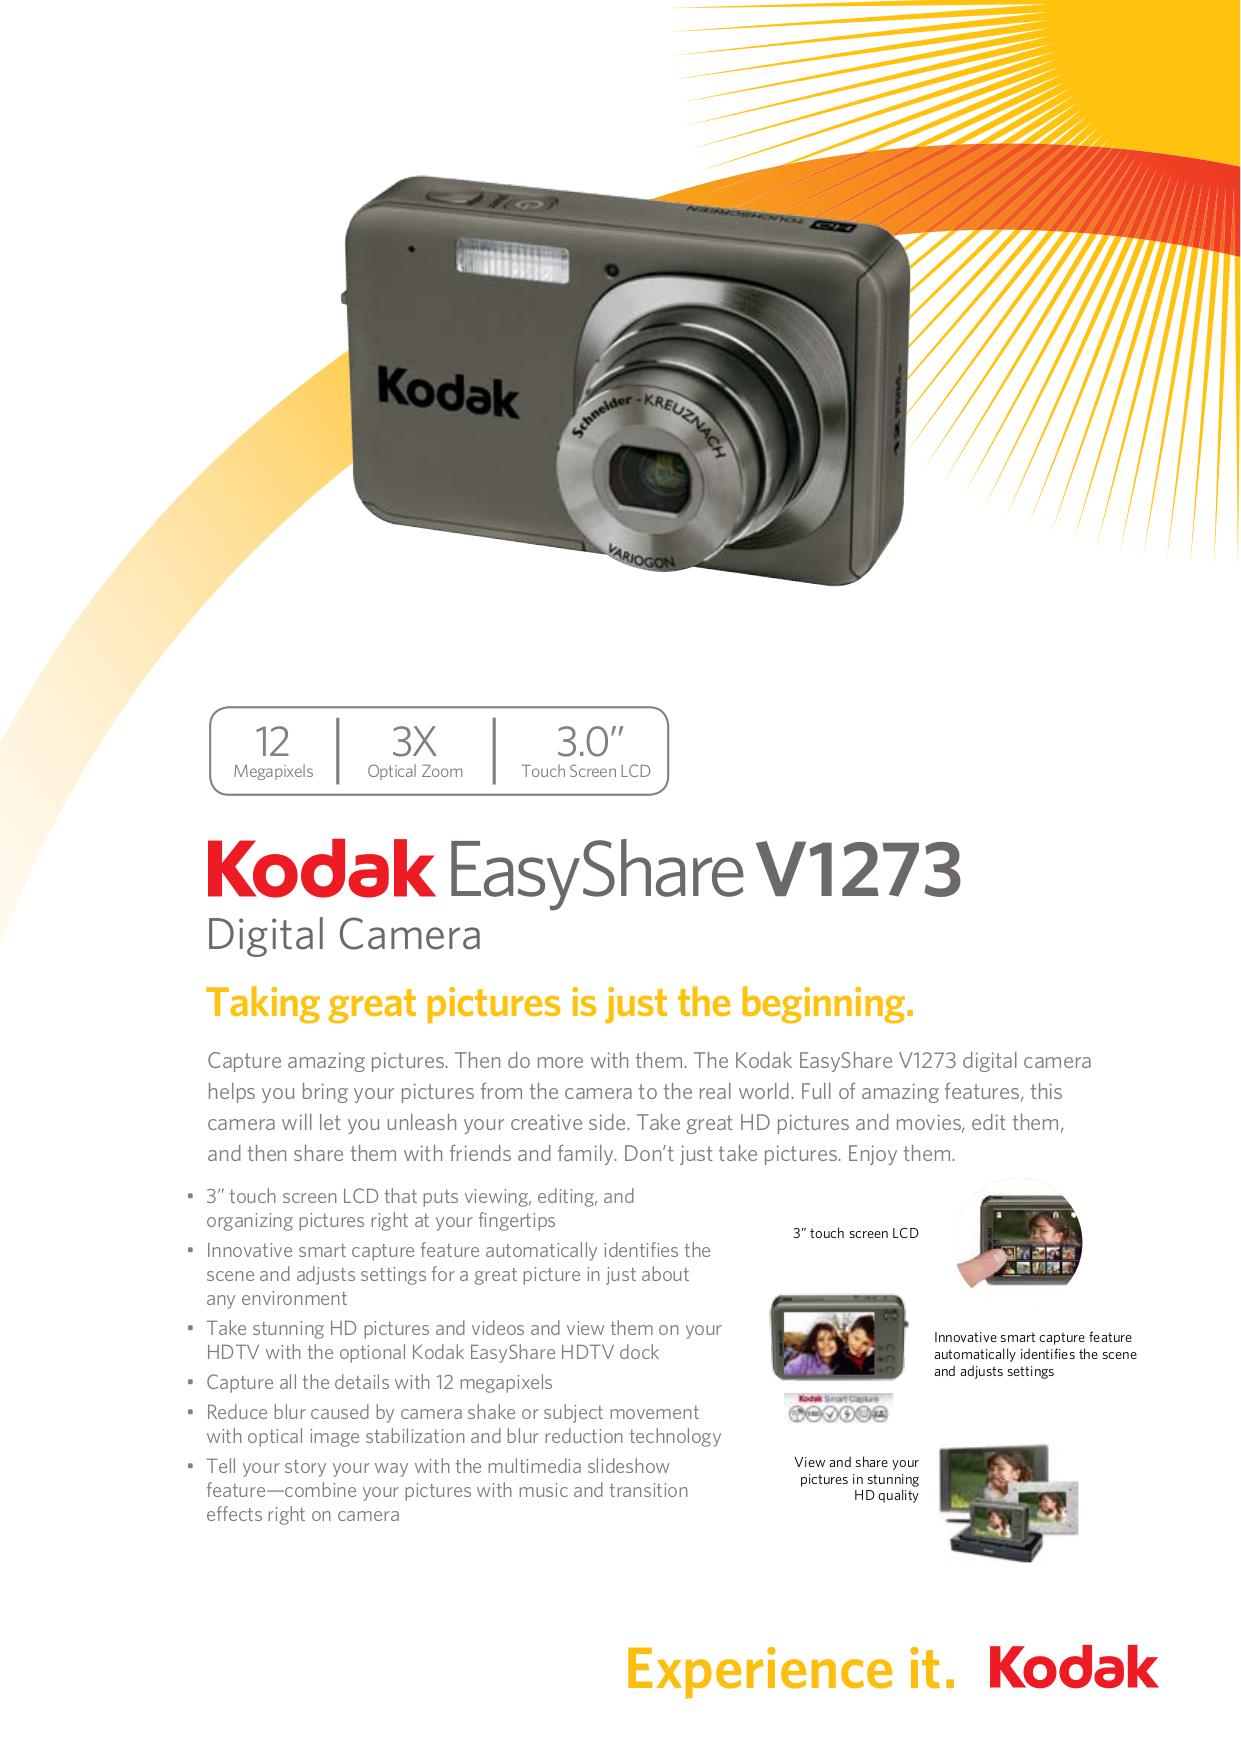 download free pdf for kodak easyshare v1273 digital camera manual rh umlib com Kodak EasyShare Printer Owner's Manual Kodak EasyShare